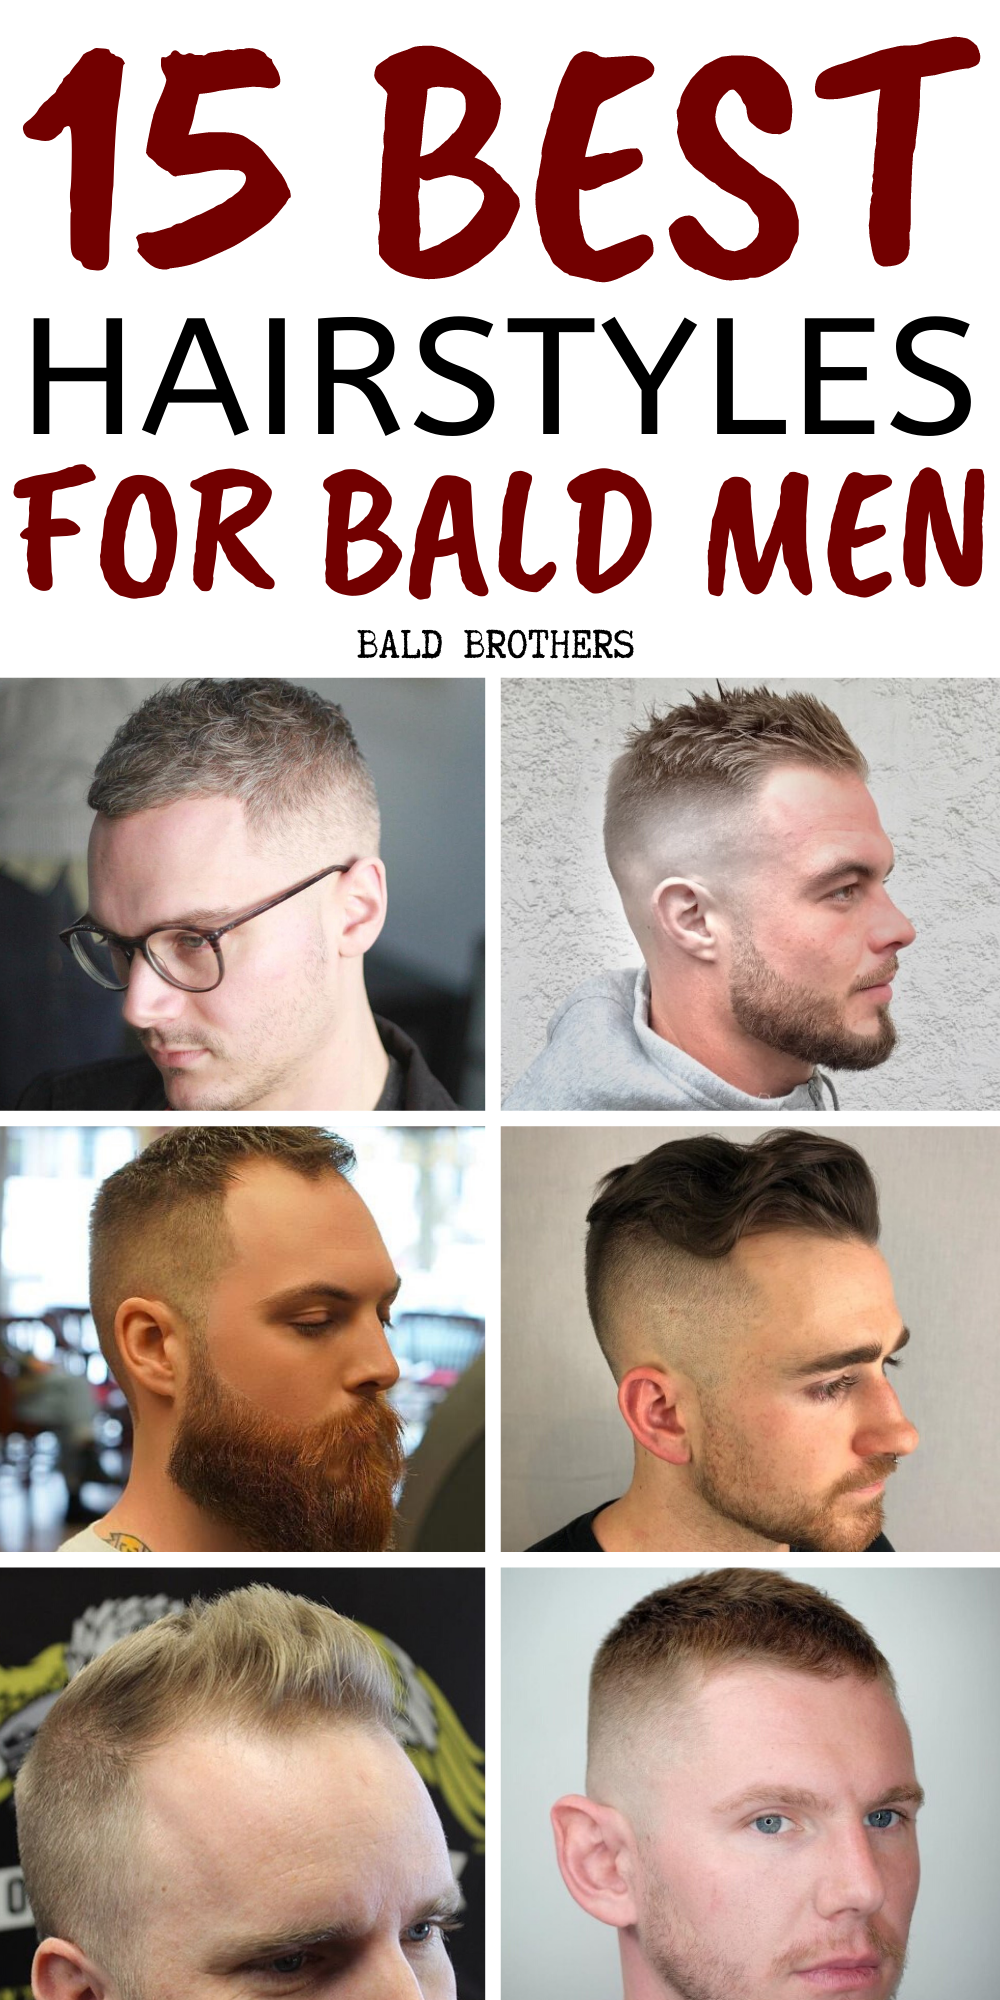 15 Of The Best Hairstyles For Balding Men The Bald Brothers Balding Mens Hairstyles Haircuts For Balding Men Thin Hair Men